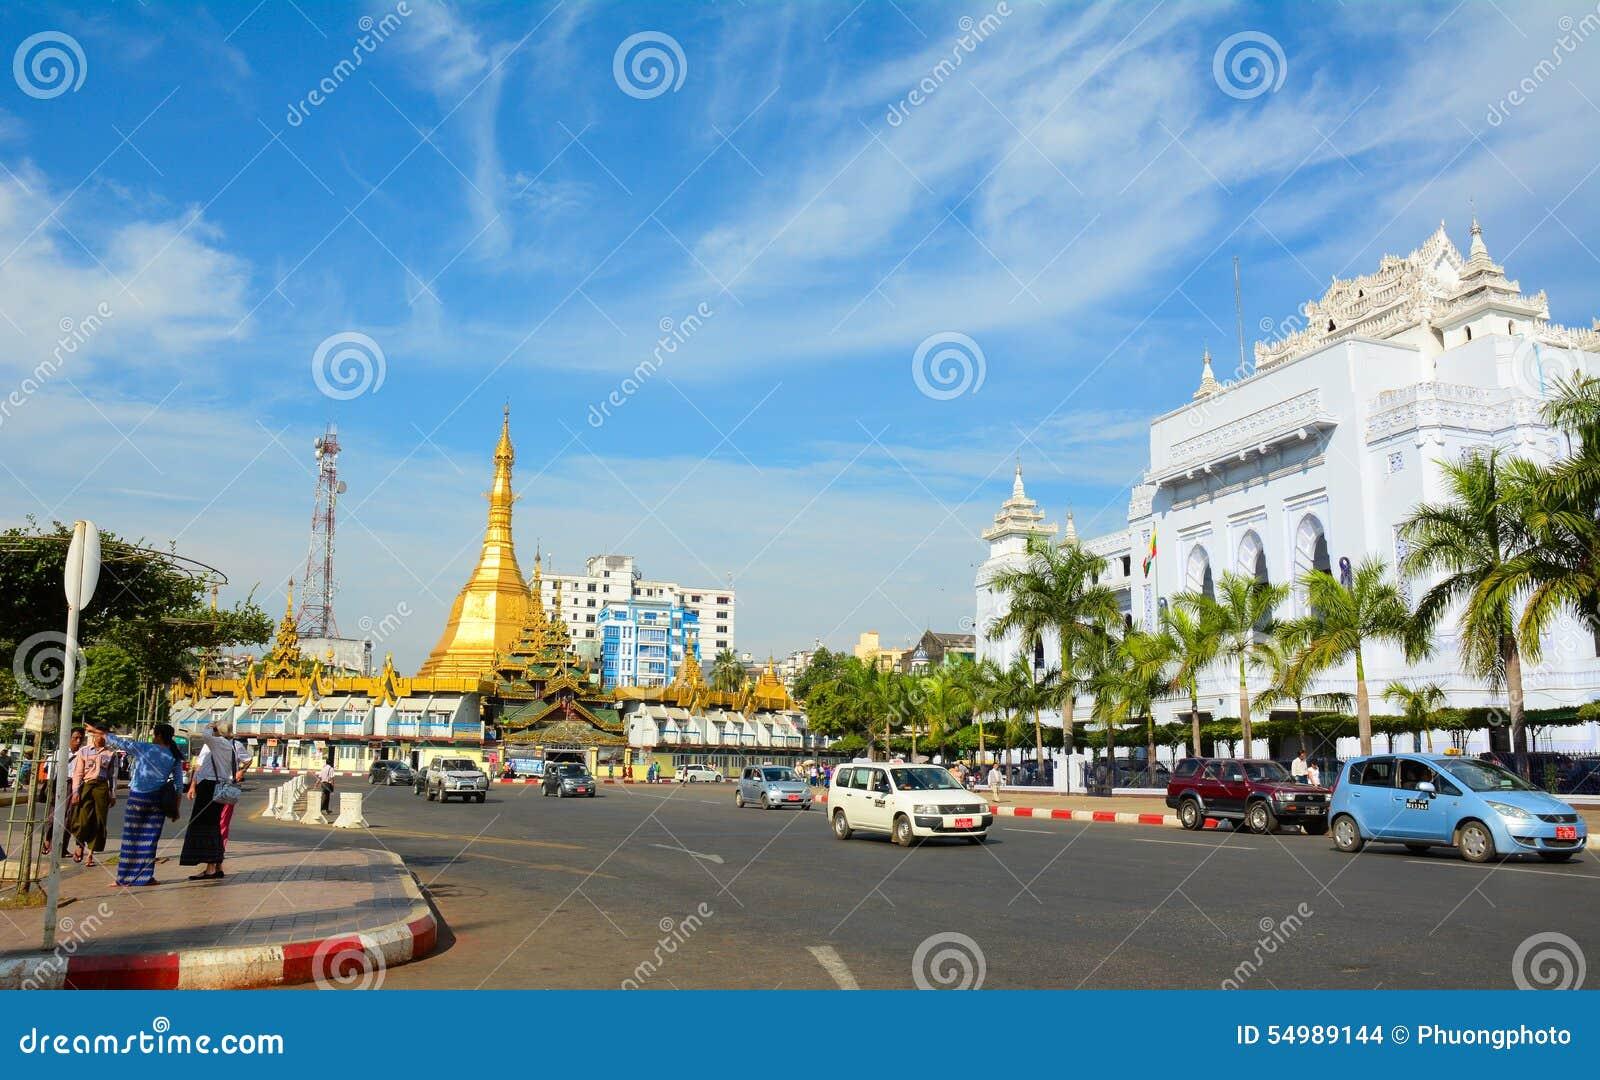 Tráfego em Yangon do centro, Myanmar